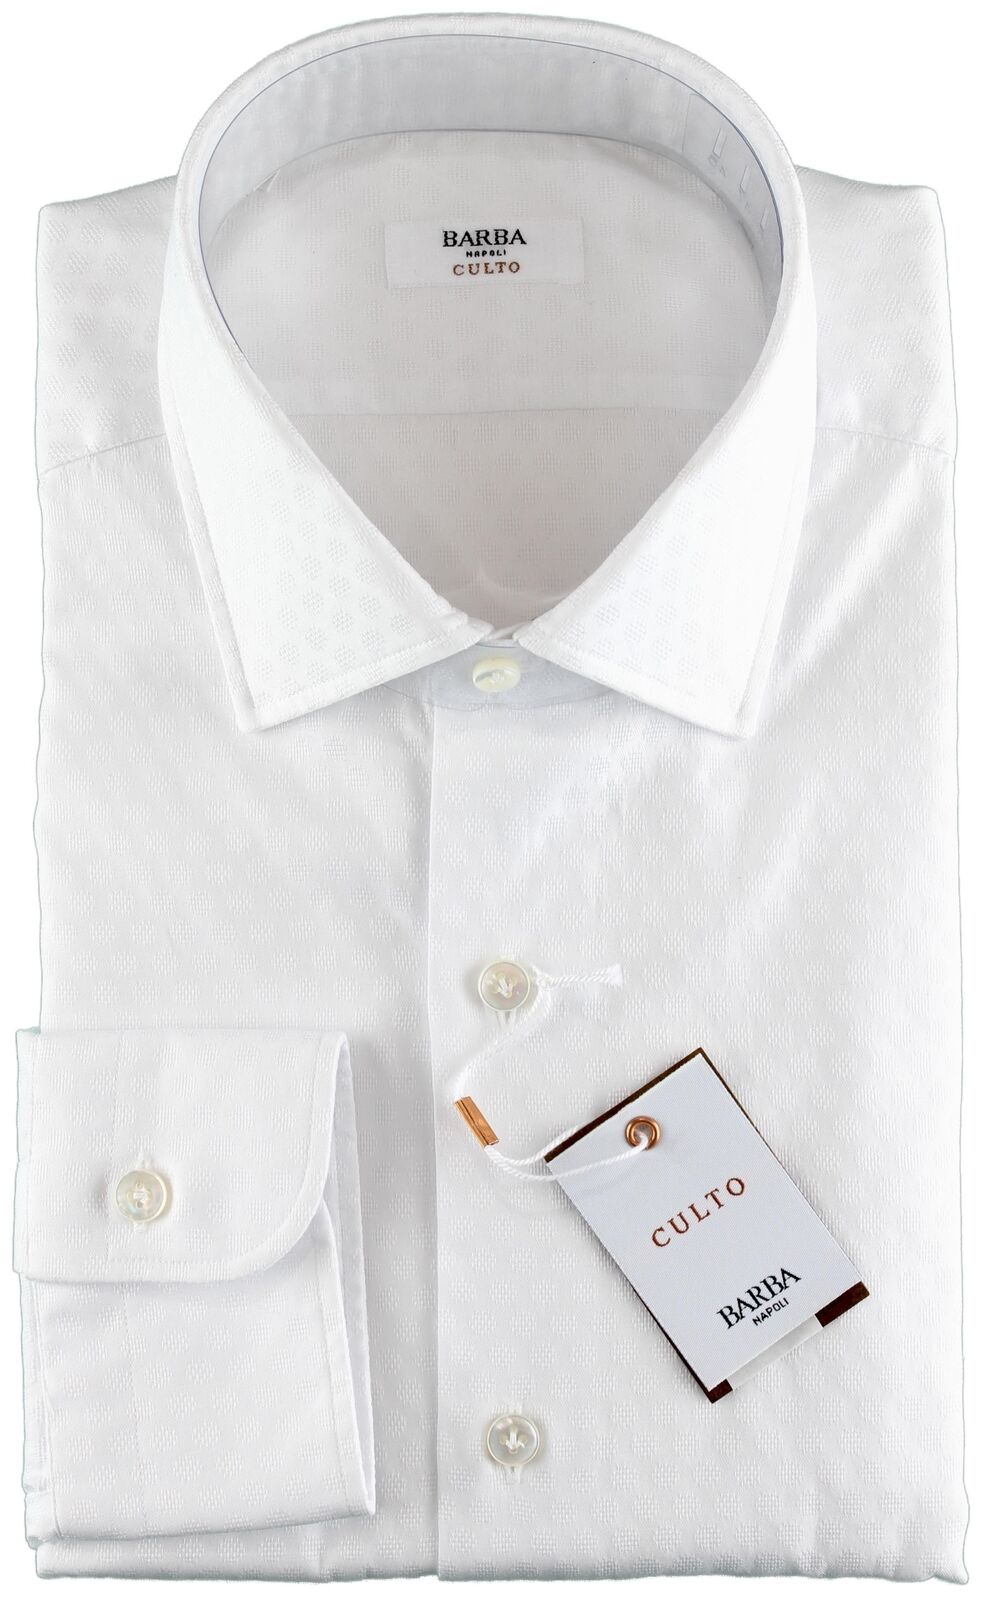 NWT BARBA NAPOLI hemd Culto Weiß polka dot handmade 41 16